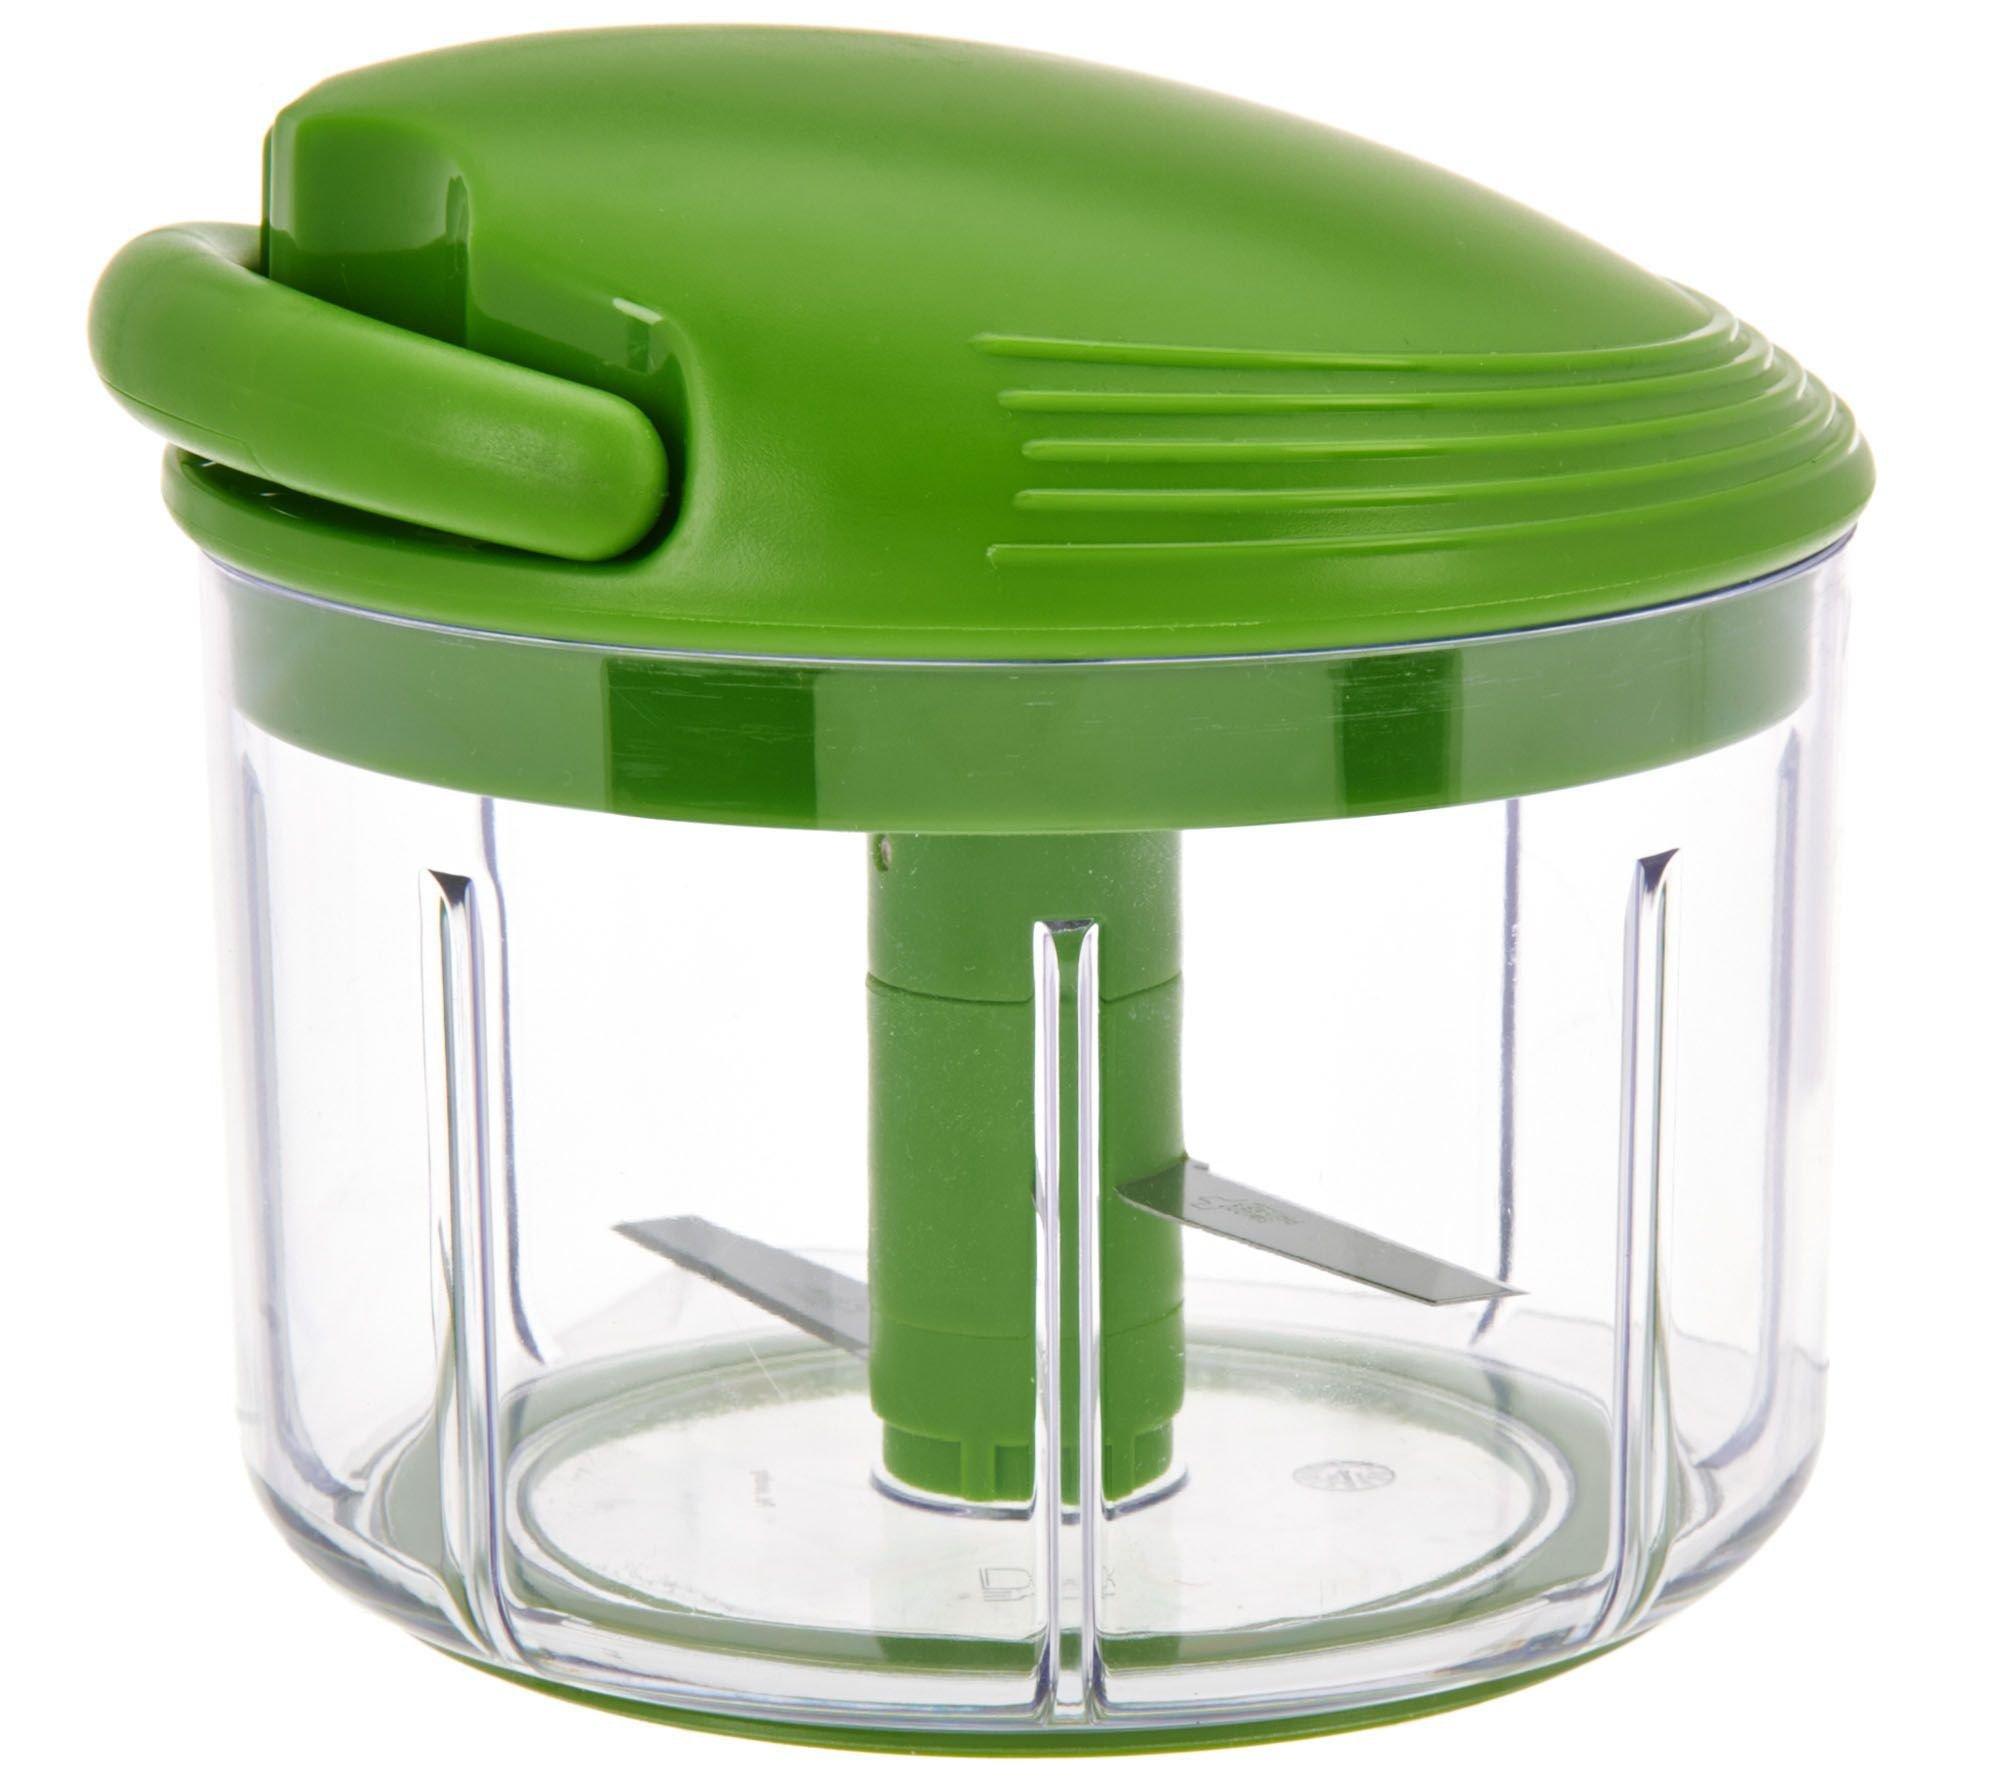 Kuhn Rikon 2.4 Cup Pull Chop Food Chopper, Green by Kuhn Rikon